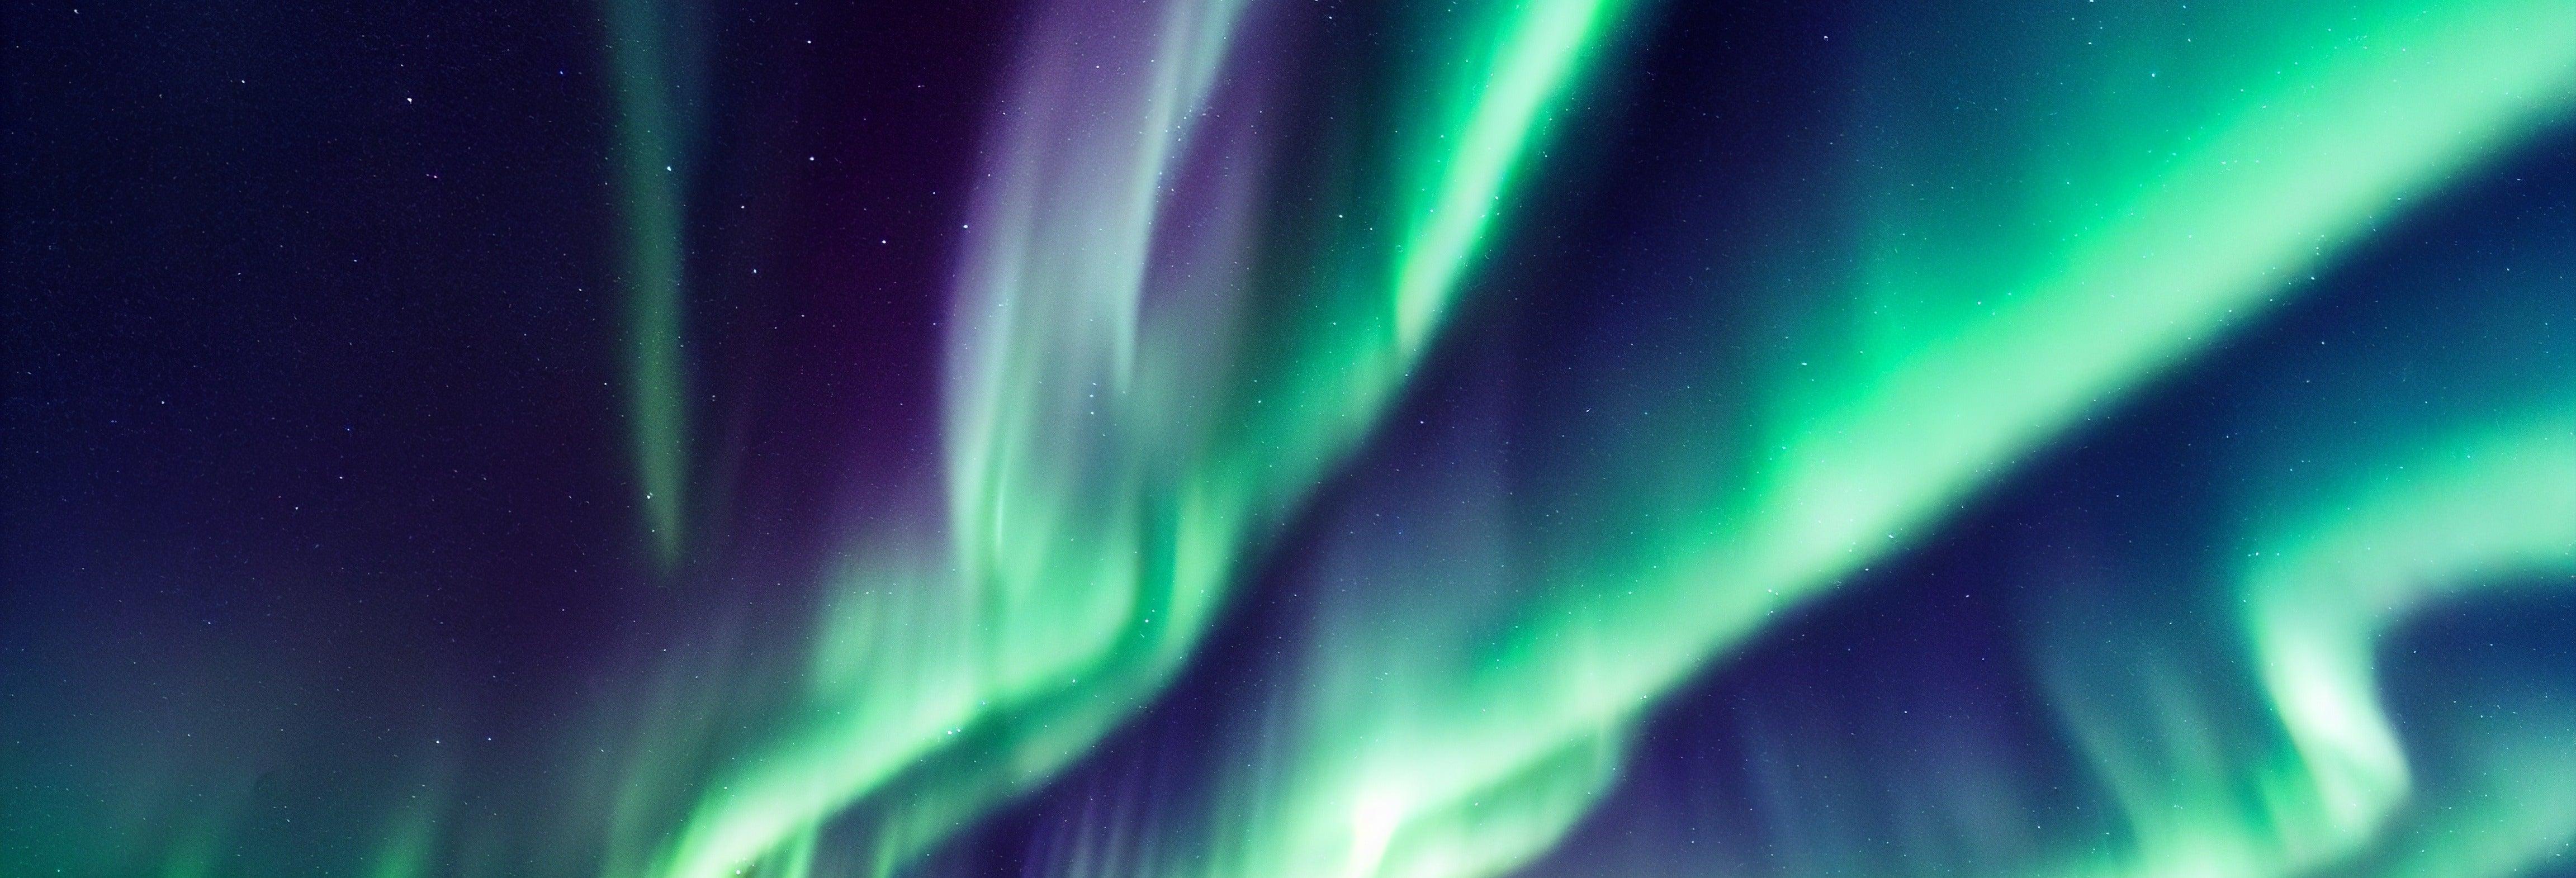 Tour en quad + Aurora boreal